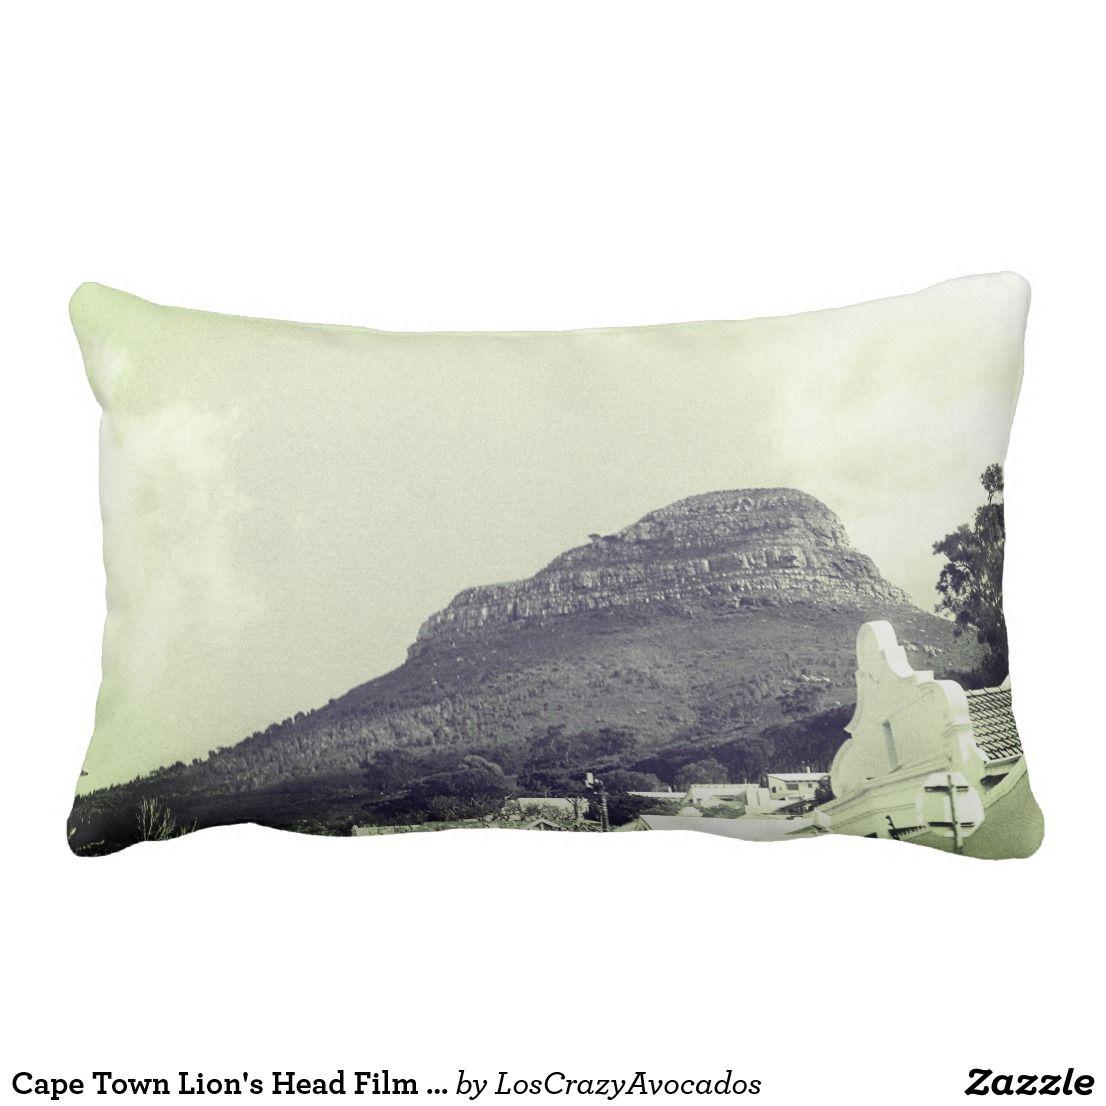 Cape Town Lion S Head Film Photo Throw Pillow Zazzle Com Pillows Cushions Throw Pillows Pillows Cape